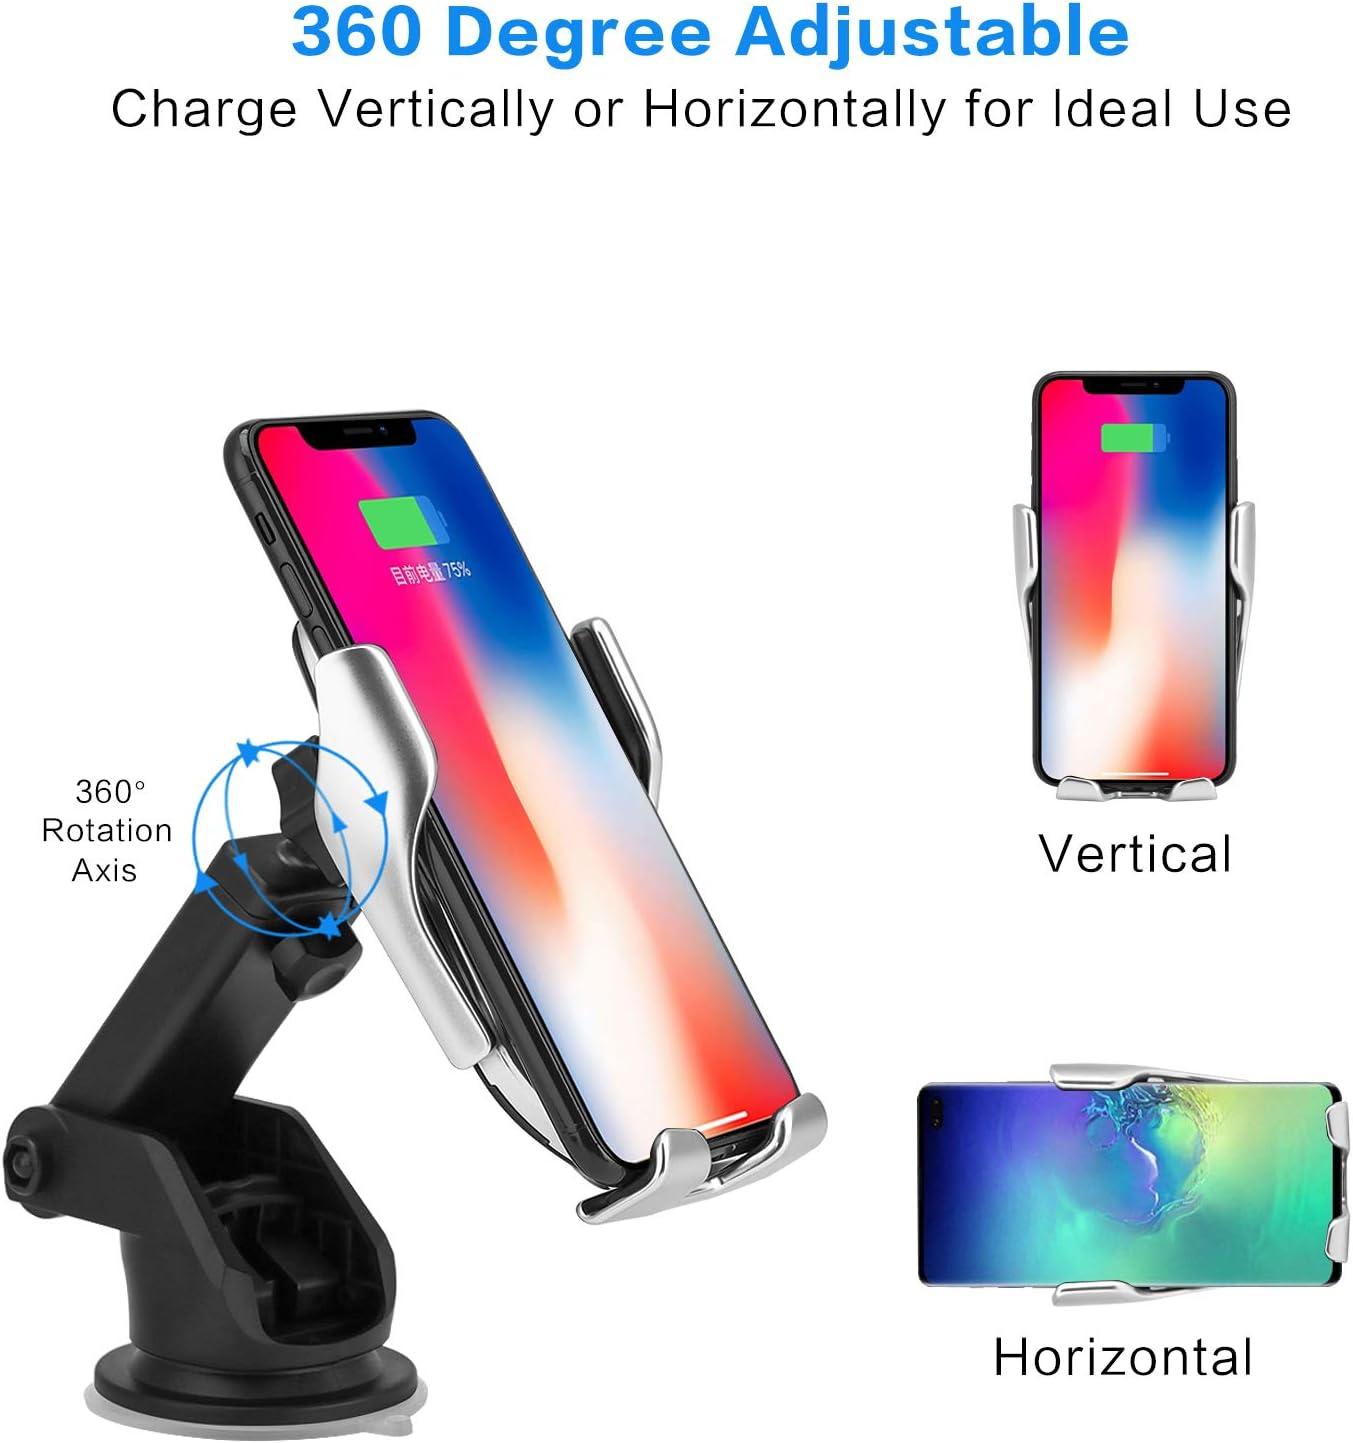 5W QI-Enabled Qi Cargador R/ápido Wireless Car Charger Soporte M/óvil 10W para Samsung S10//S10+//S9//S8//S8+//Note 8,7.5W para iPhone XS Max//XR//X//8//8 Plus Hinyx Cargador Inal/ámbrico Coche